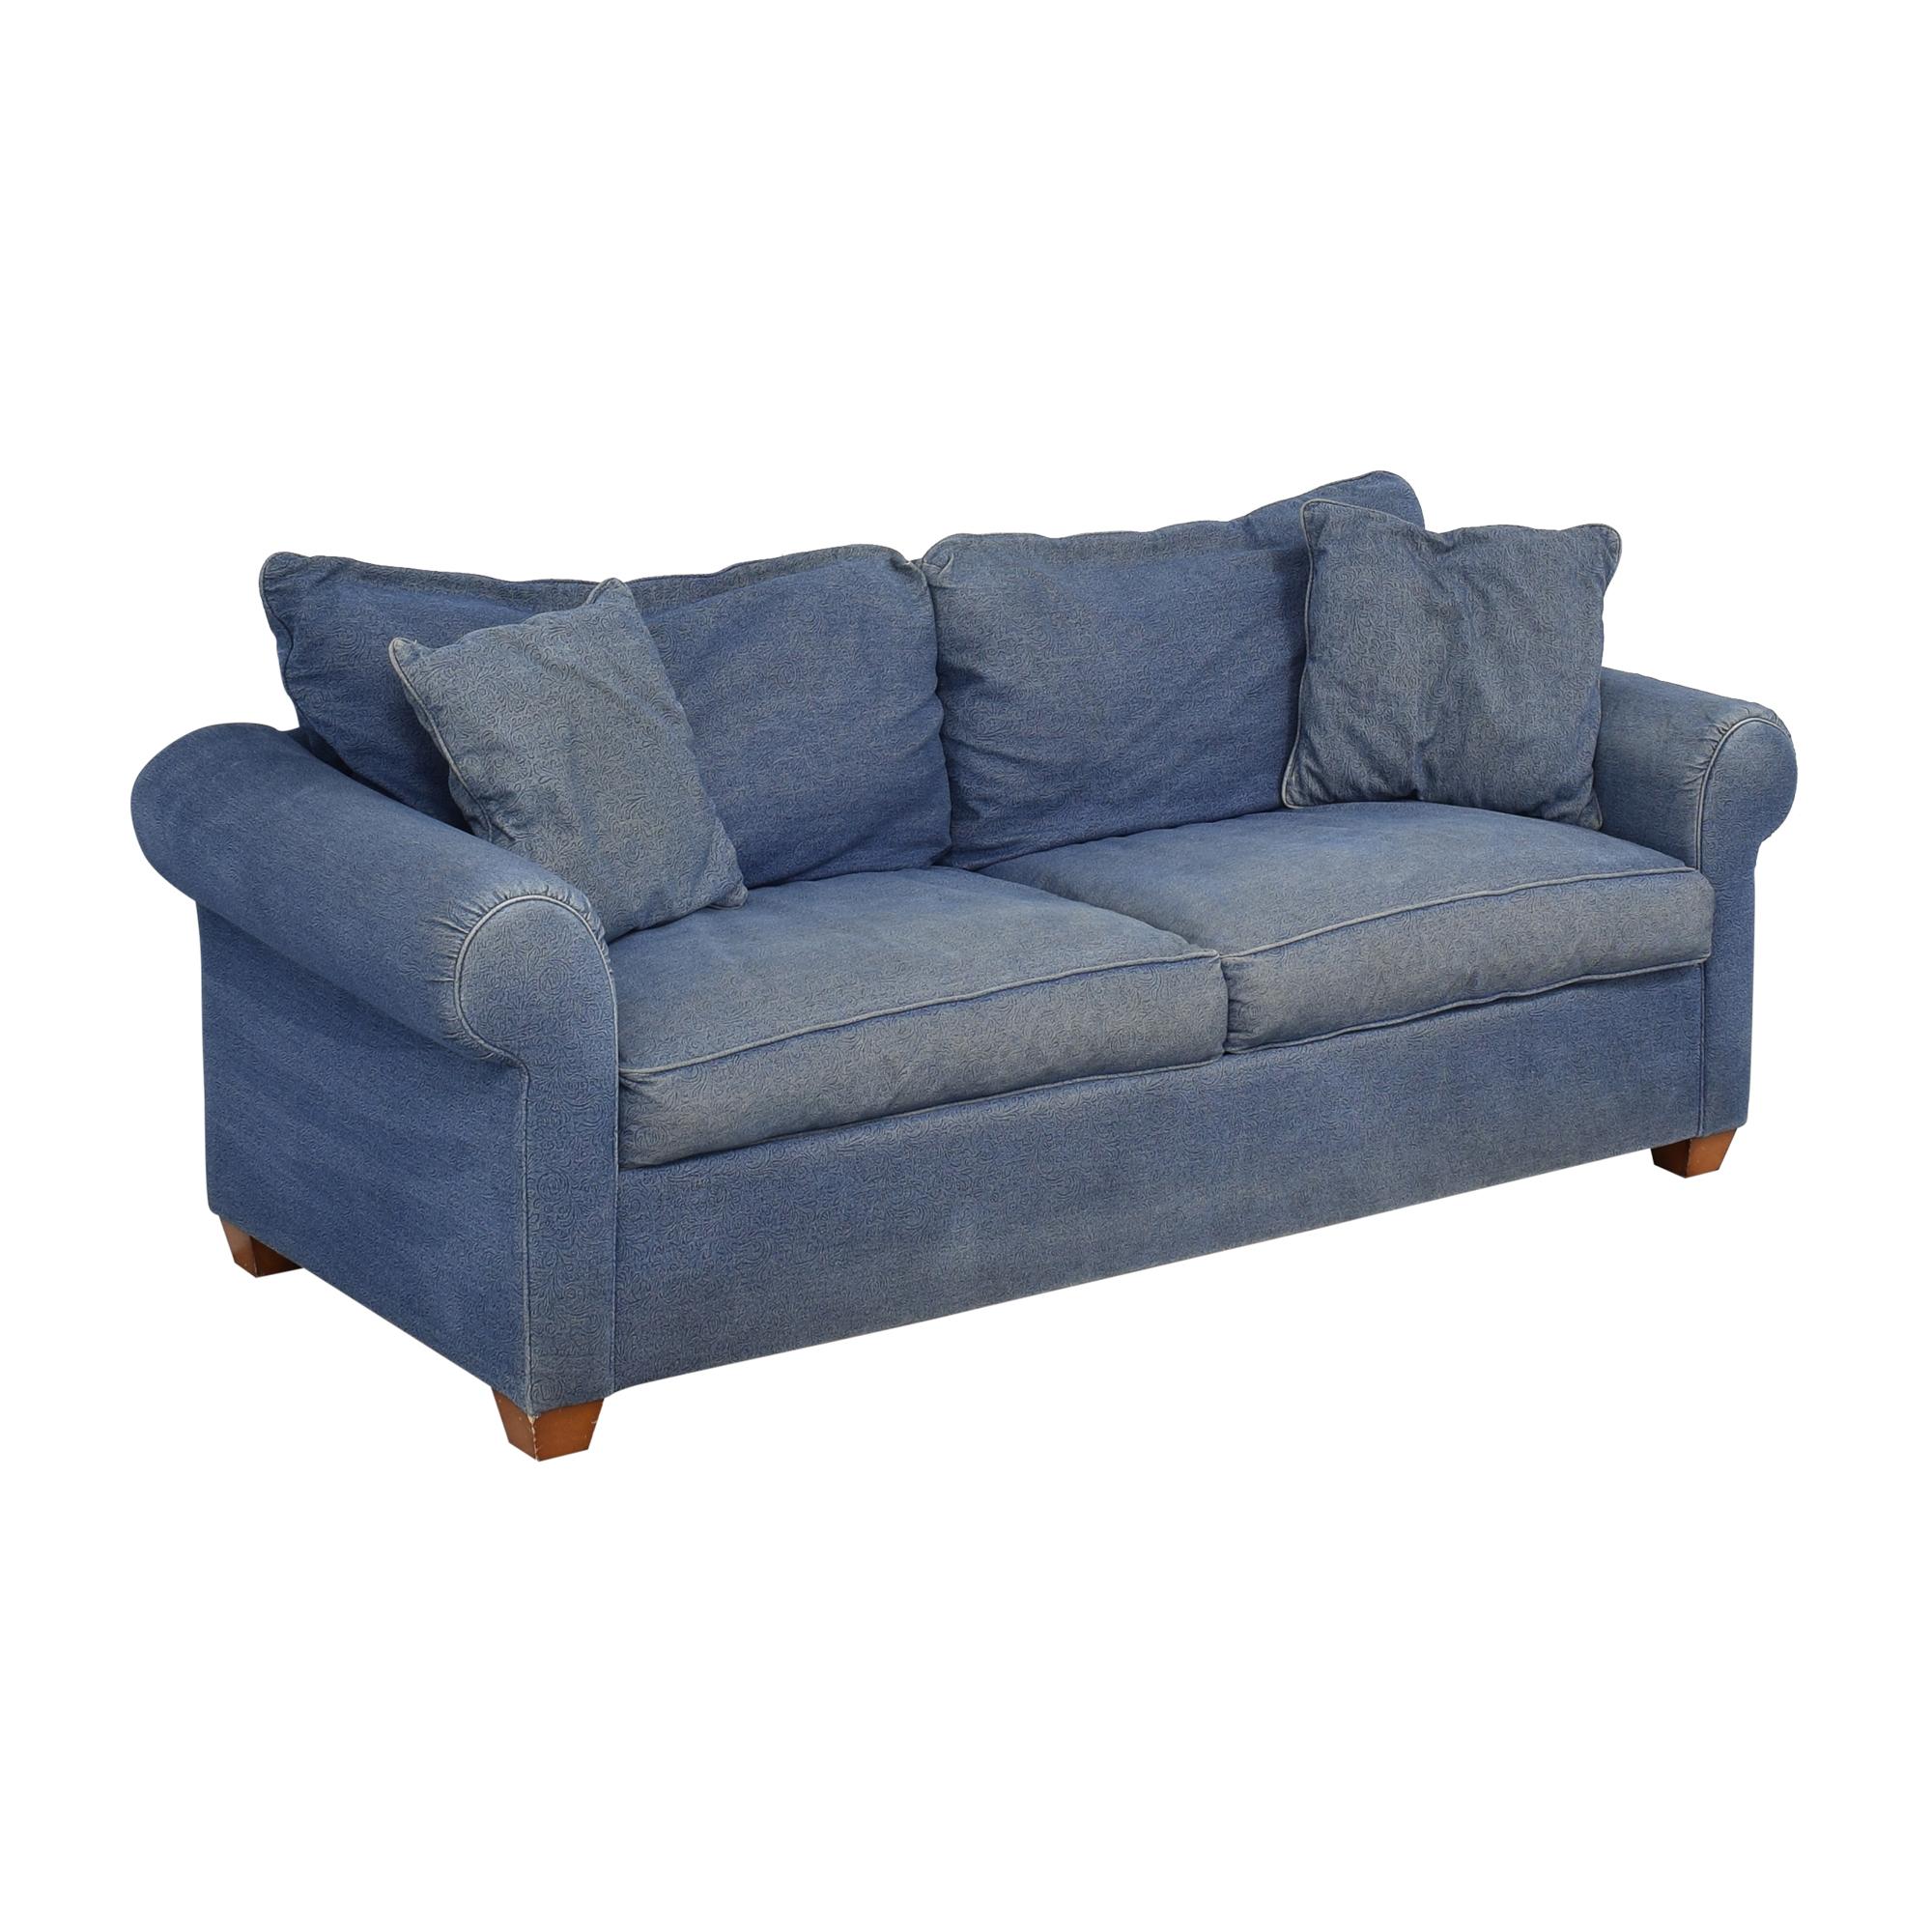 buy Leggett & Platt Denim Queen Pull Out Sofa Leggett & Platt